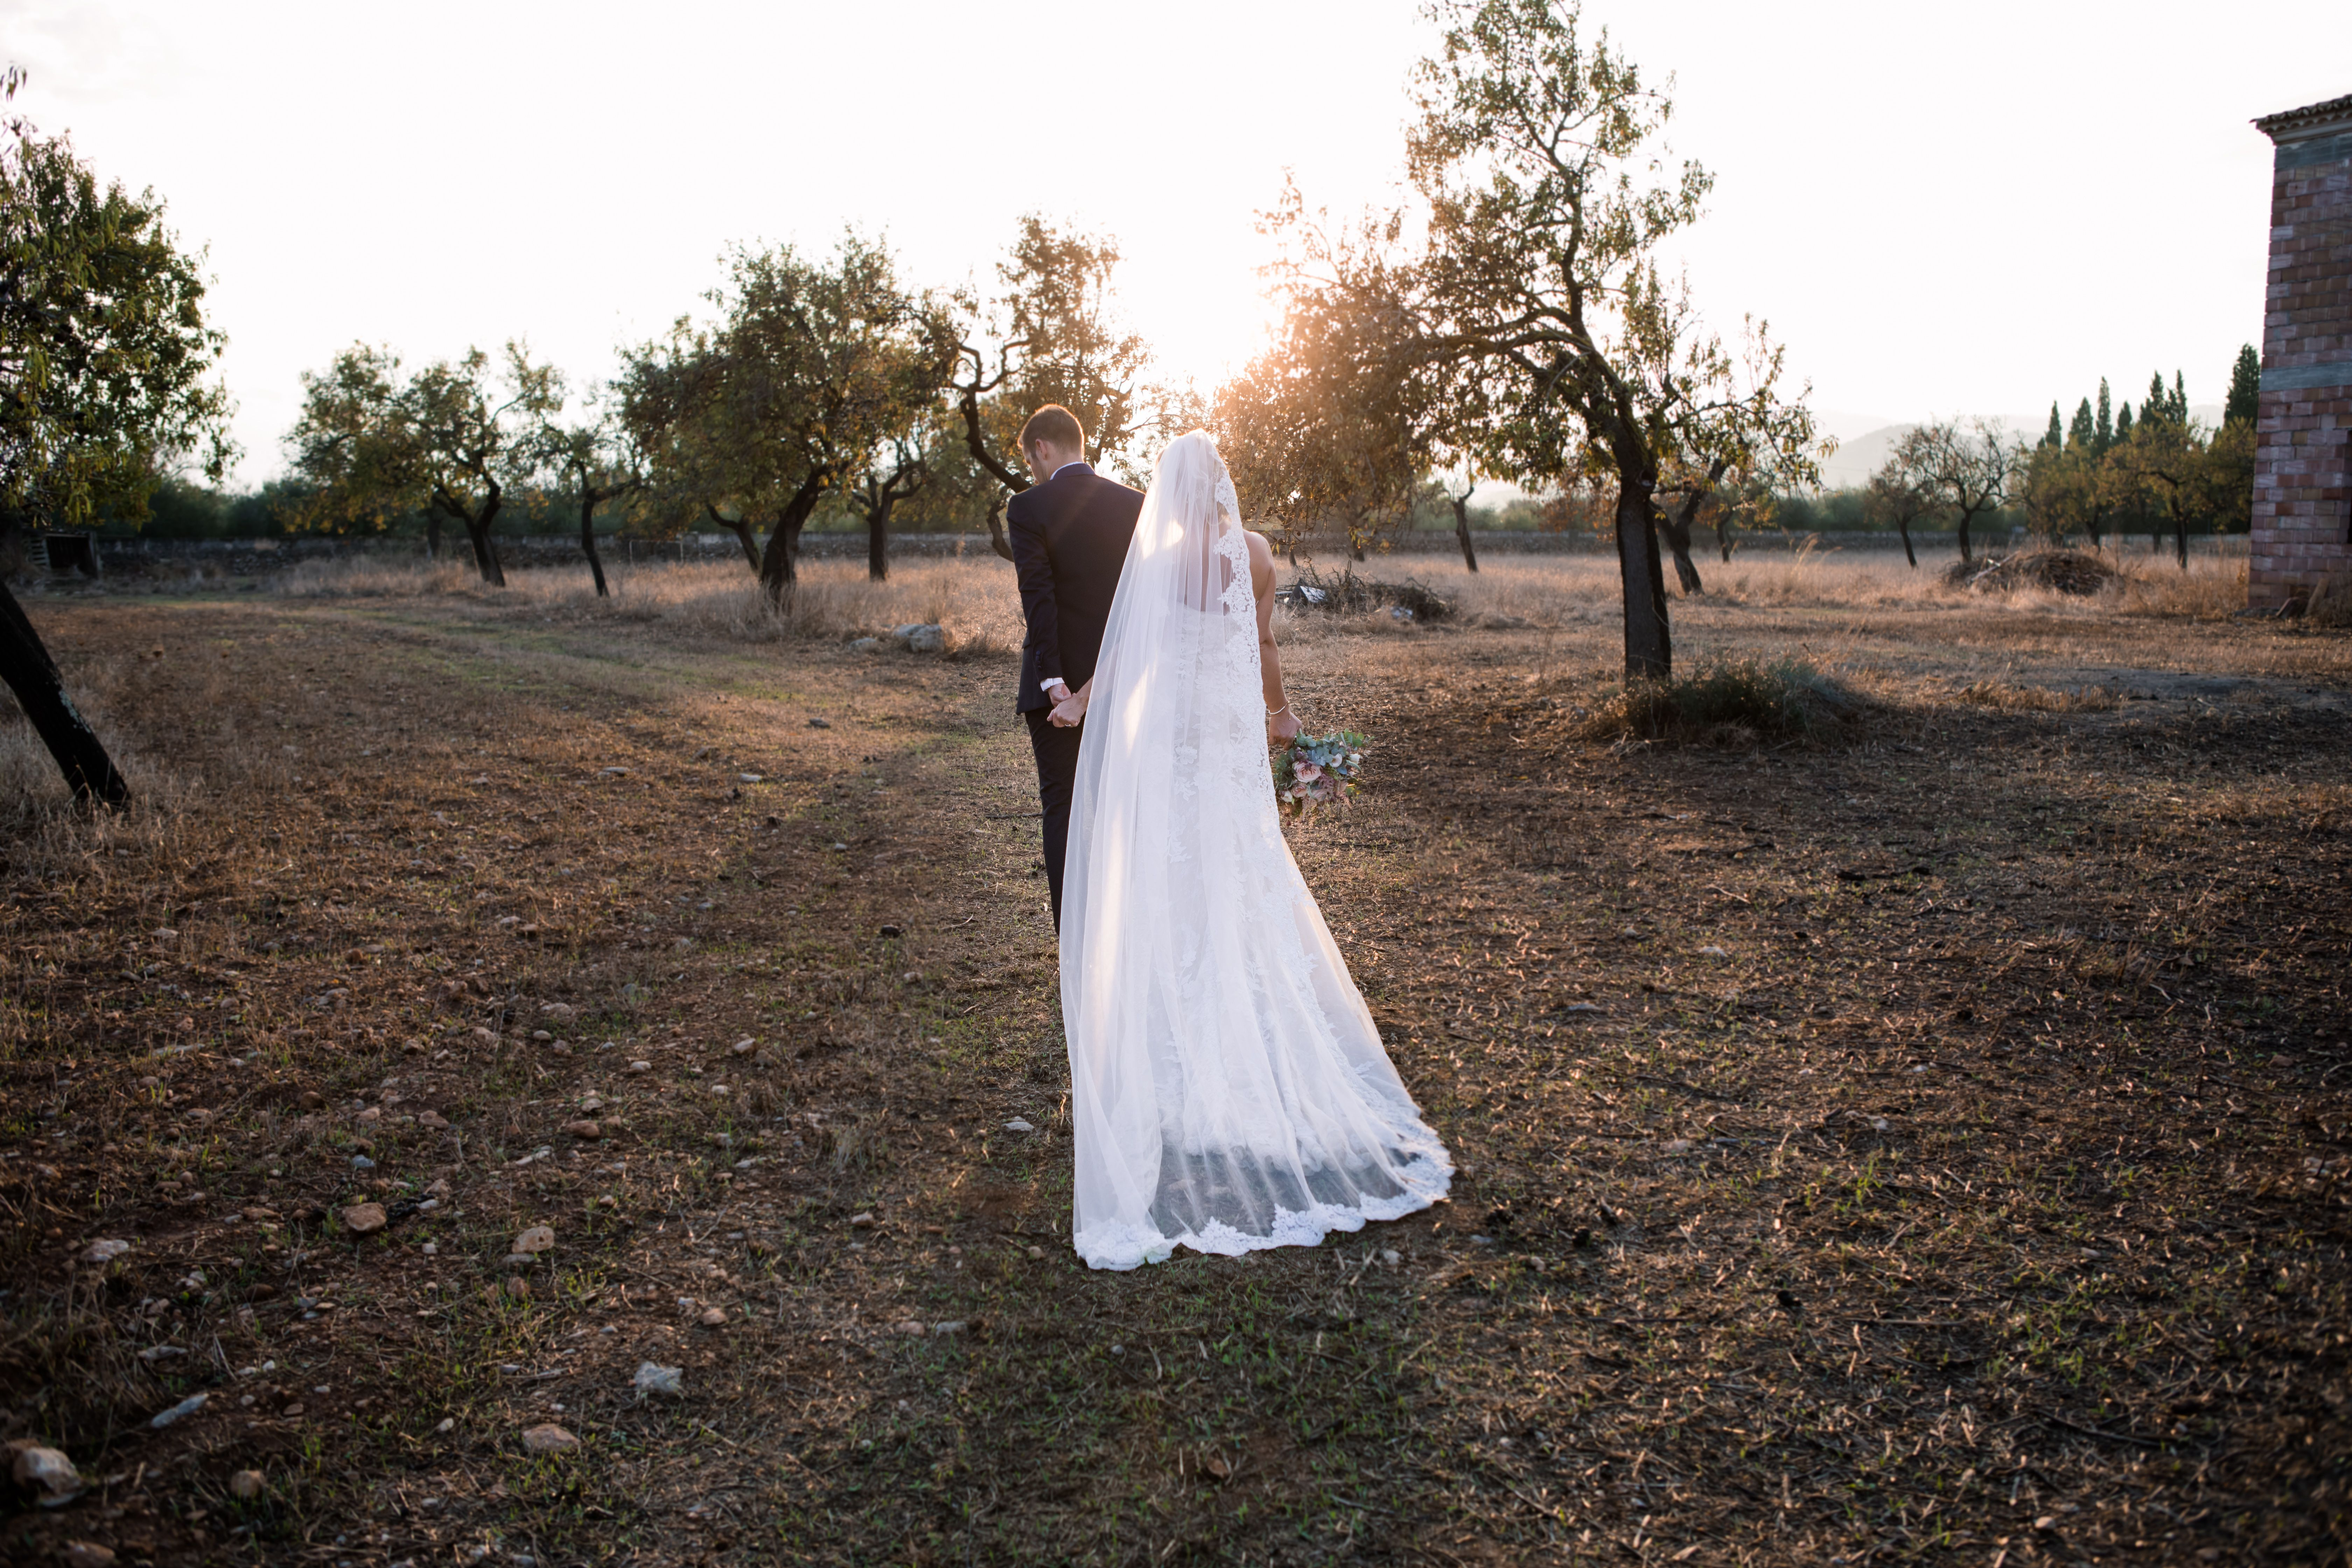 Traumhochzeiten Wedding Hochzeitsfotografiemallorca Brautshooting Couplegoals Weddingphotos Germanys Next Topmodel Beauty Fotografie Hochzeitsfotografie